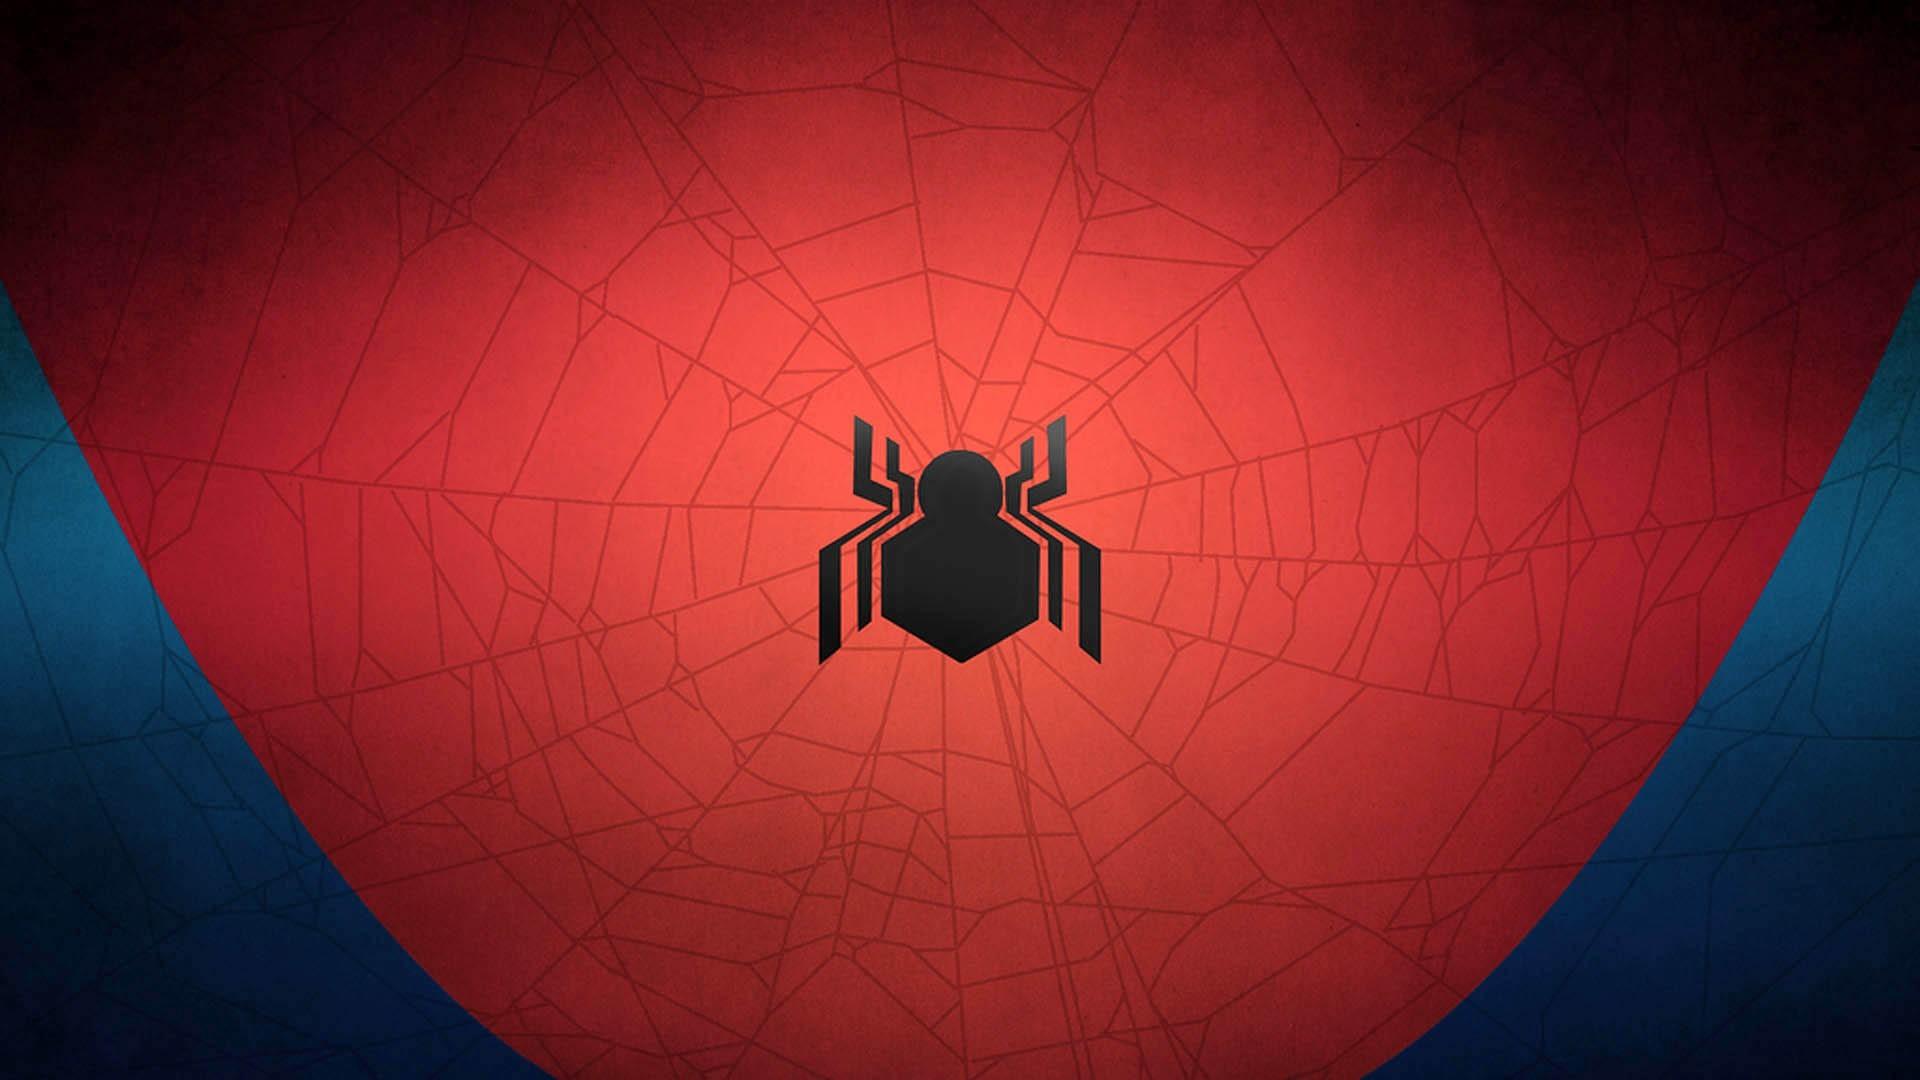 Wallpaper Homecoming: Spider Man Homecoming Wallpapers (63+ Images